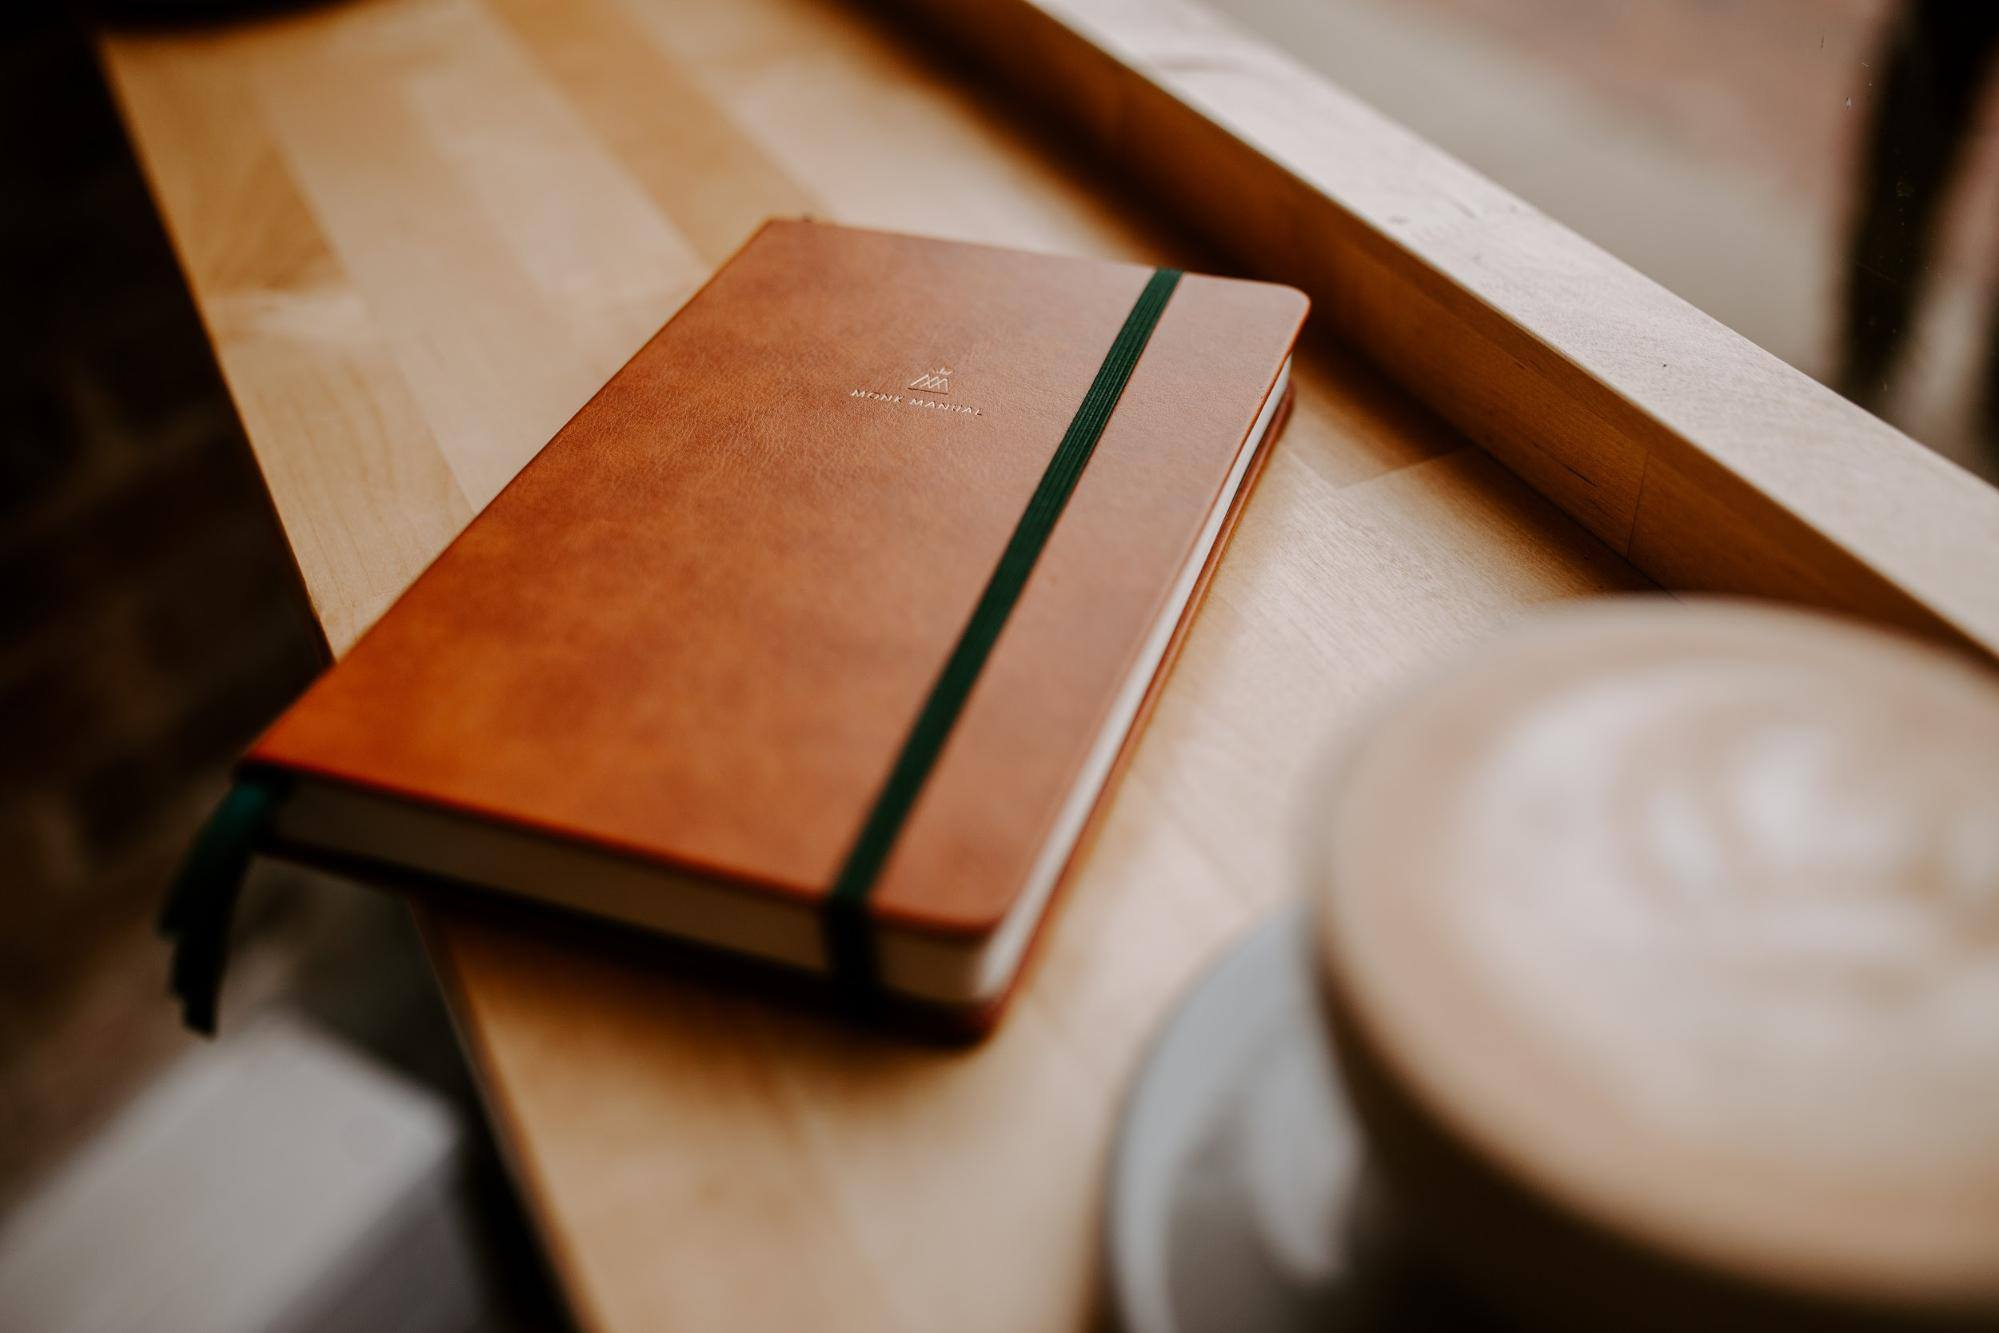 That sleek leather. Those deep green bookmarks. The crisp pages. Mmmmmmhm.